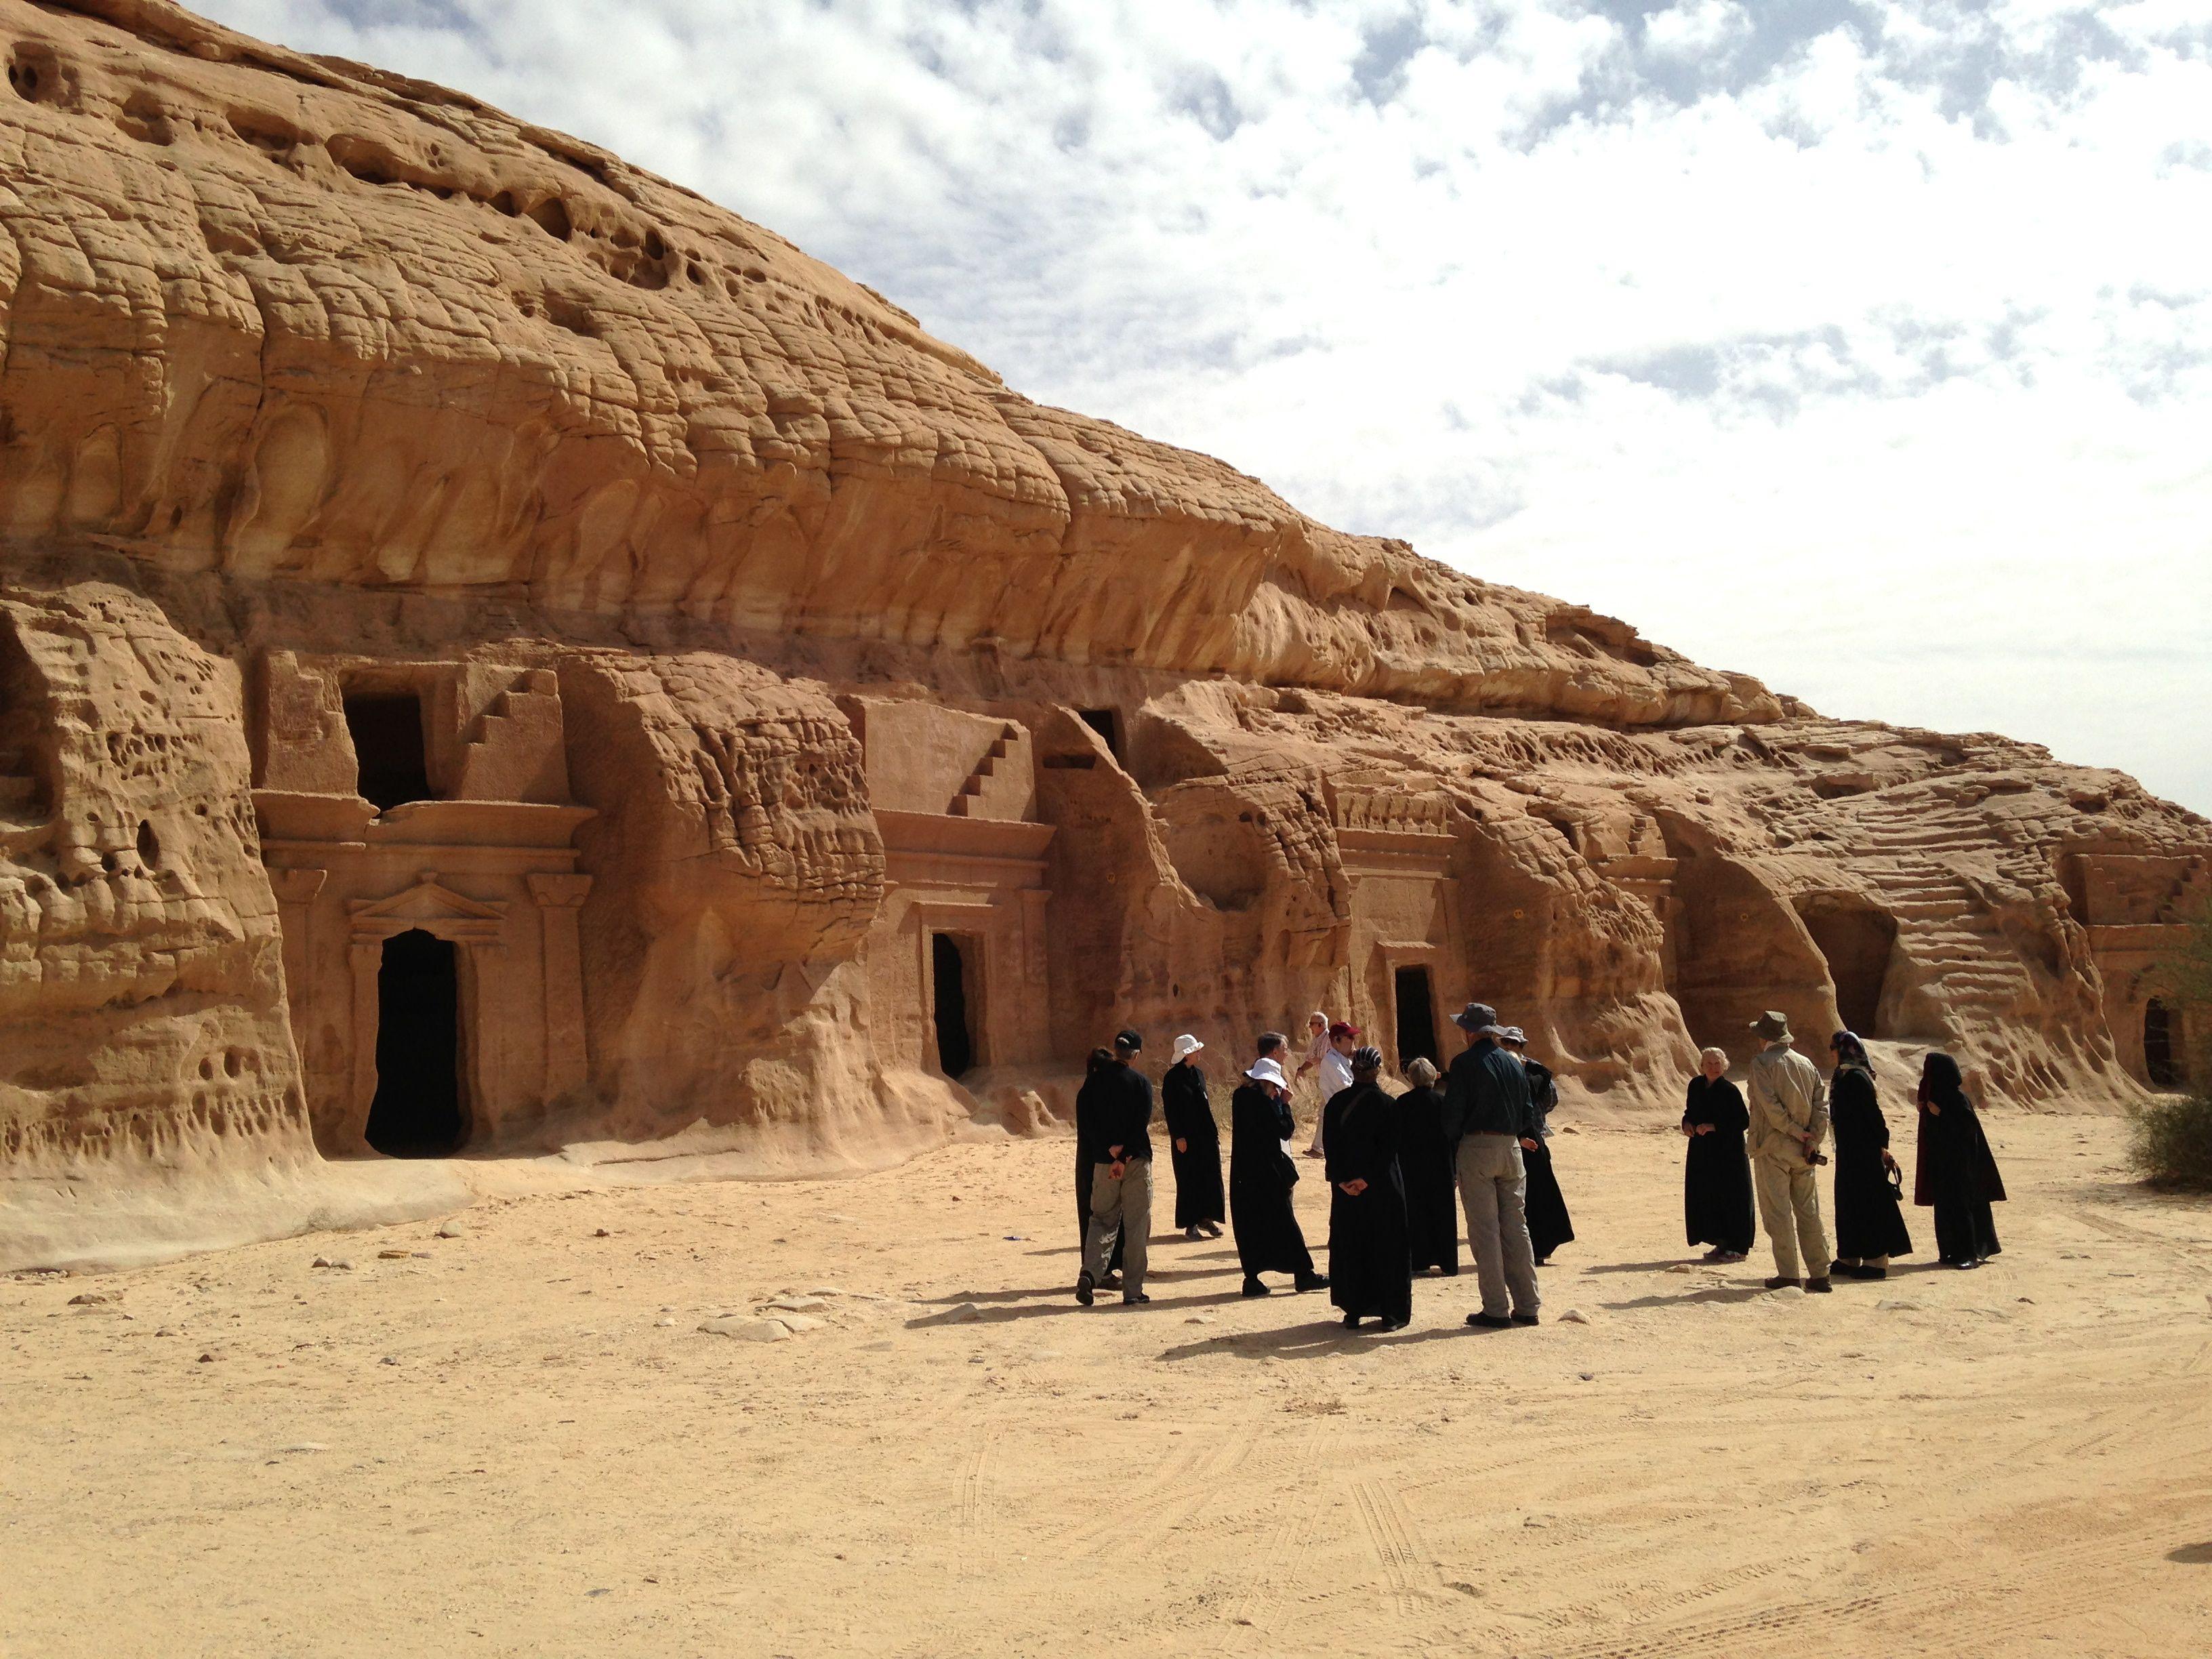 Al Ula Saudi Arabia  city photos : Al Ula and Mada'in Salih, Saudi Arabia | The World Less Traveled ...